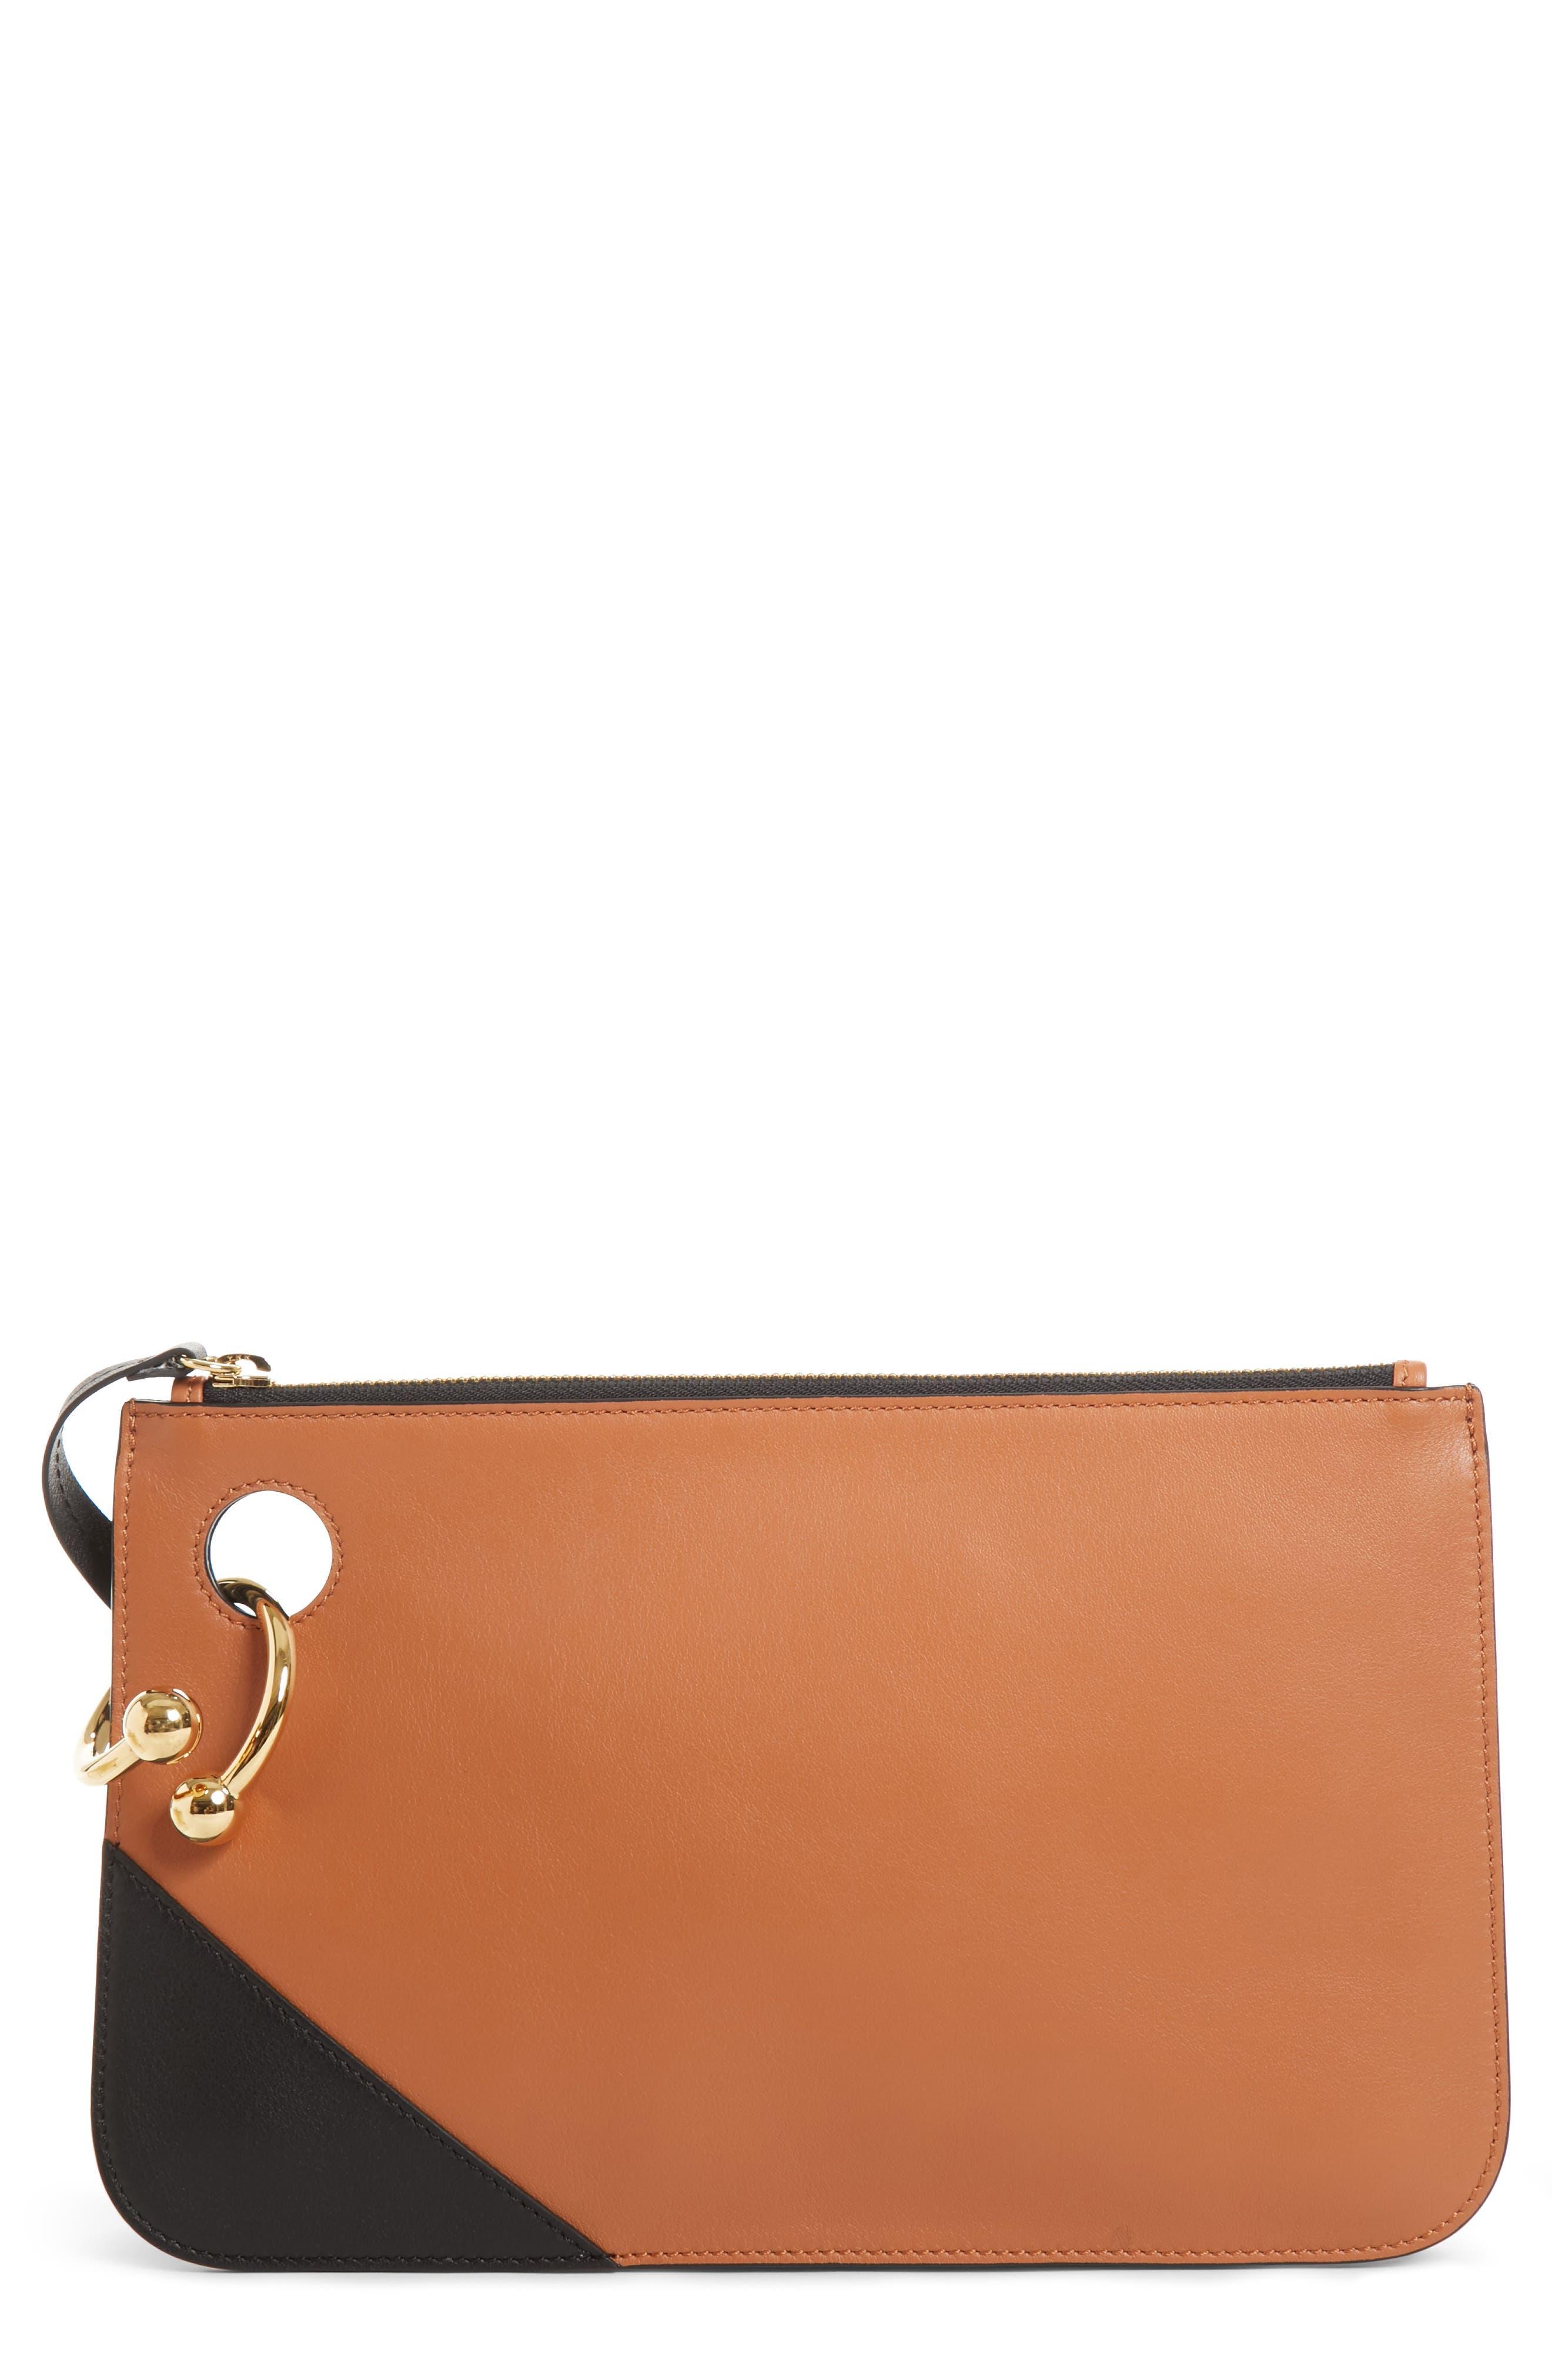 J.W.ANDERSON Pierce Colorblock Leather Clutch,                         Main,                         color, Tan/Black